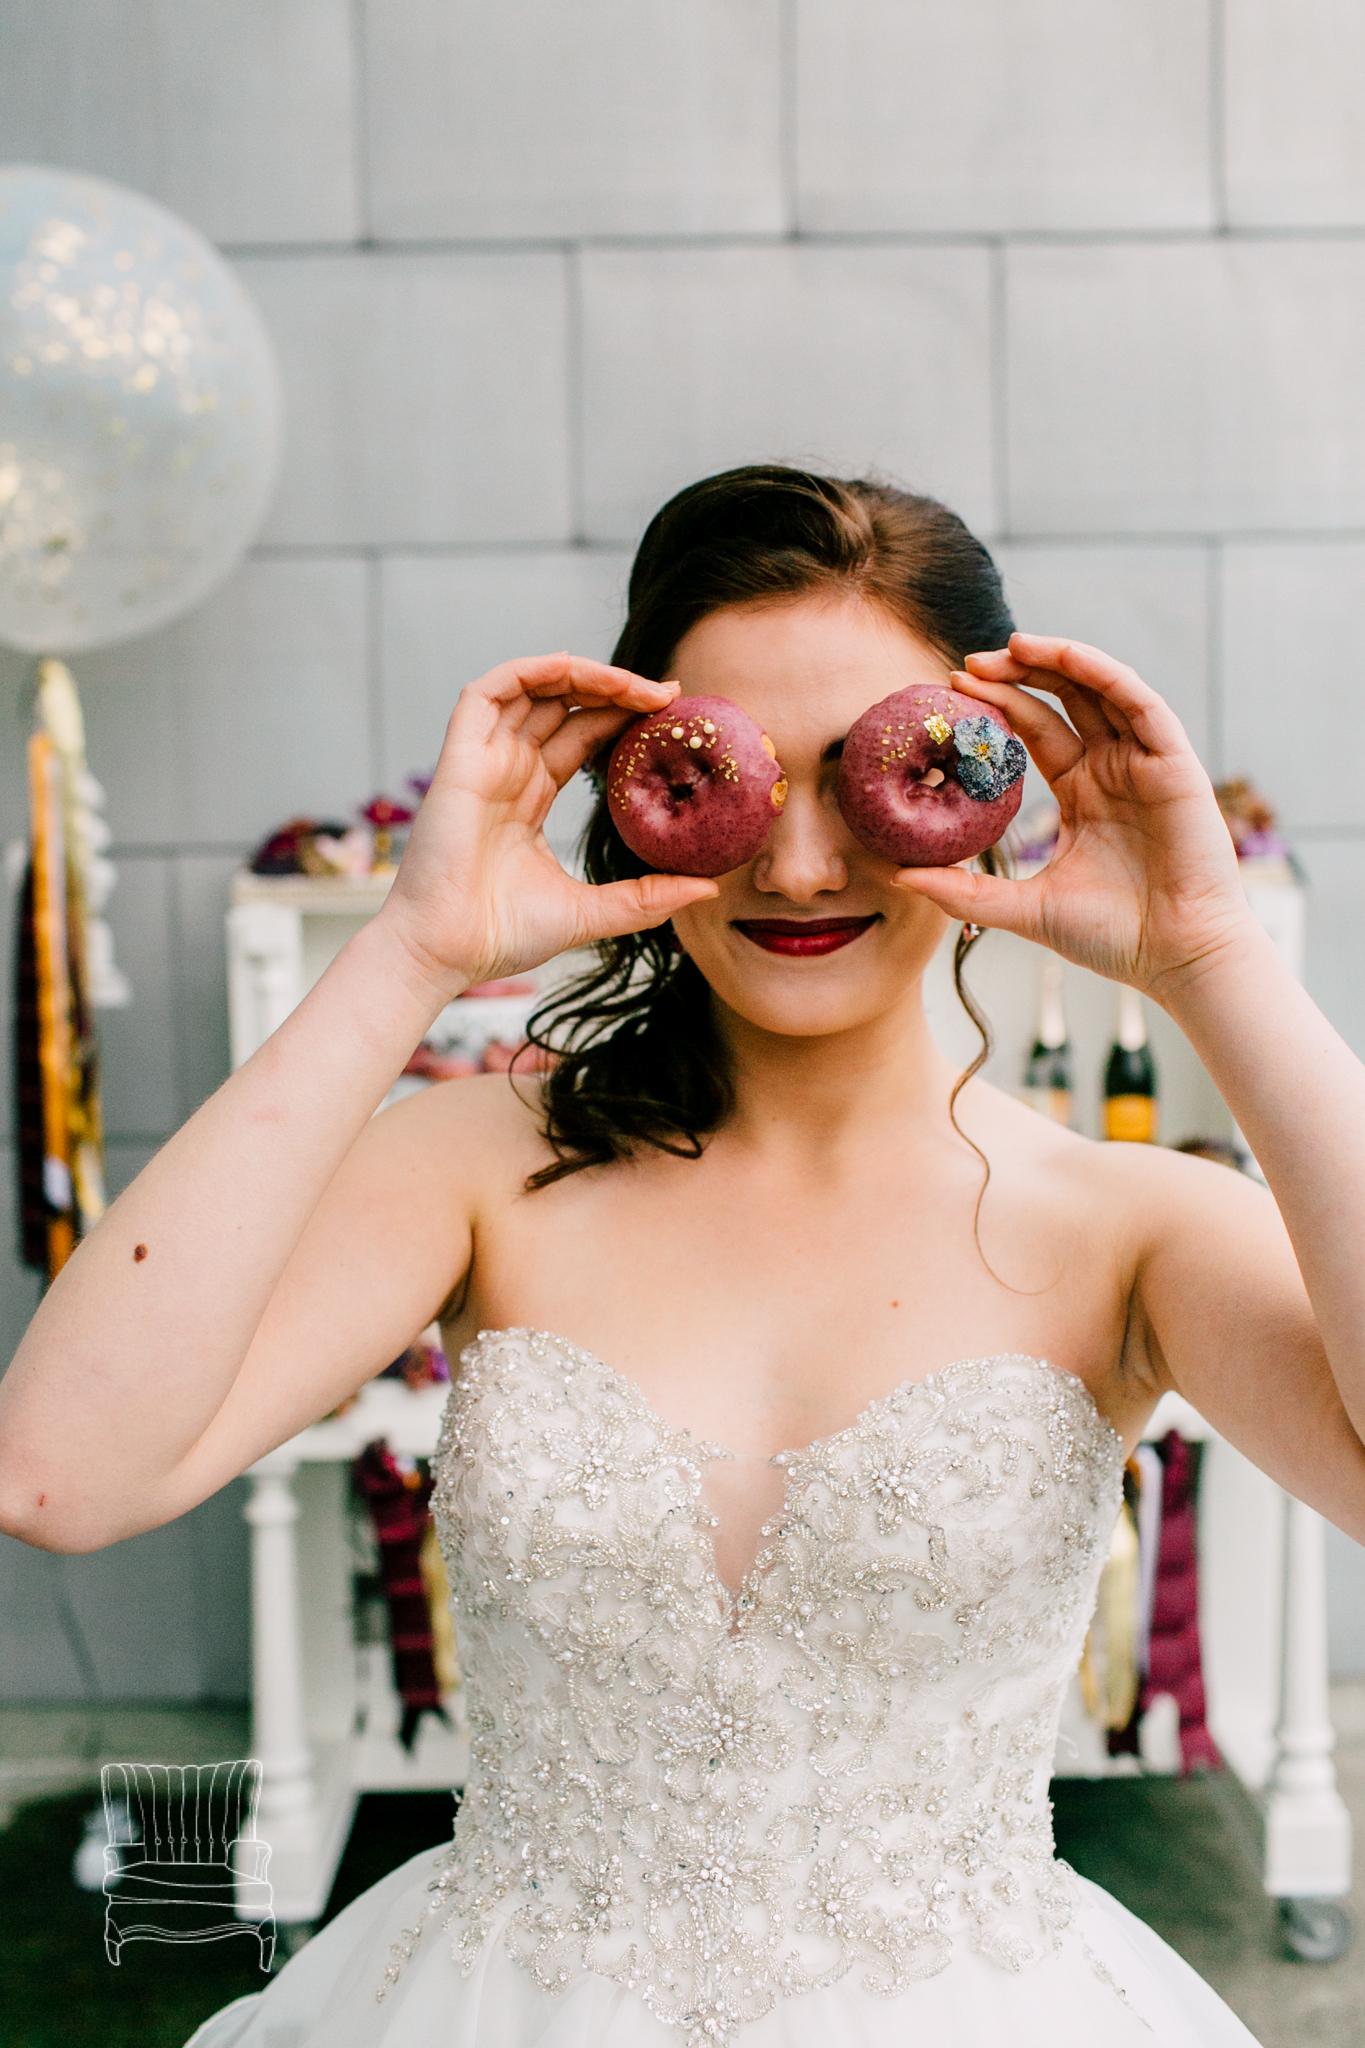 bellwether-hotel-bellingham-wedding-photographer-katheryn-moran-glitz-glam-styled-528.jpg